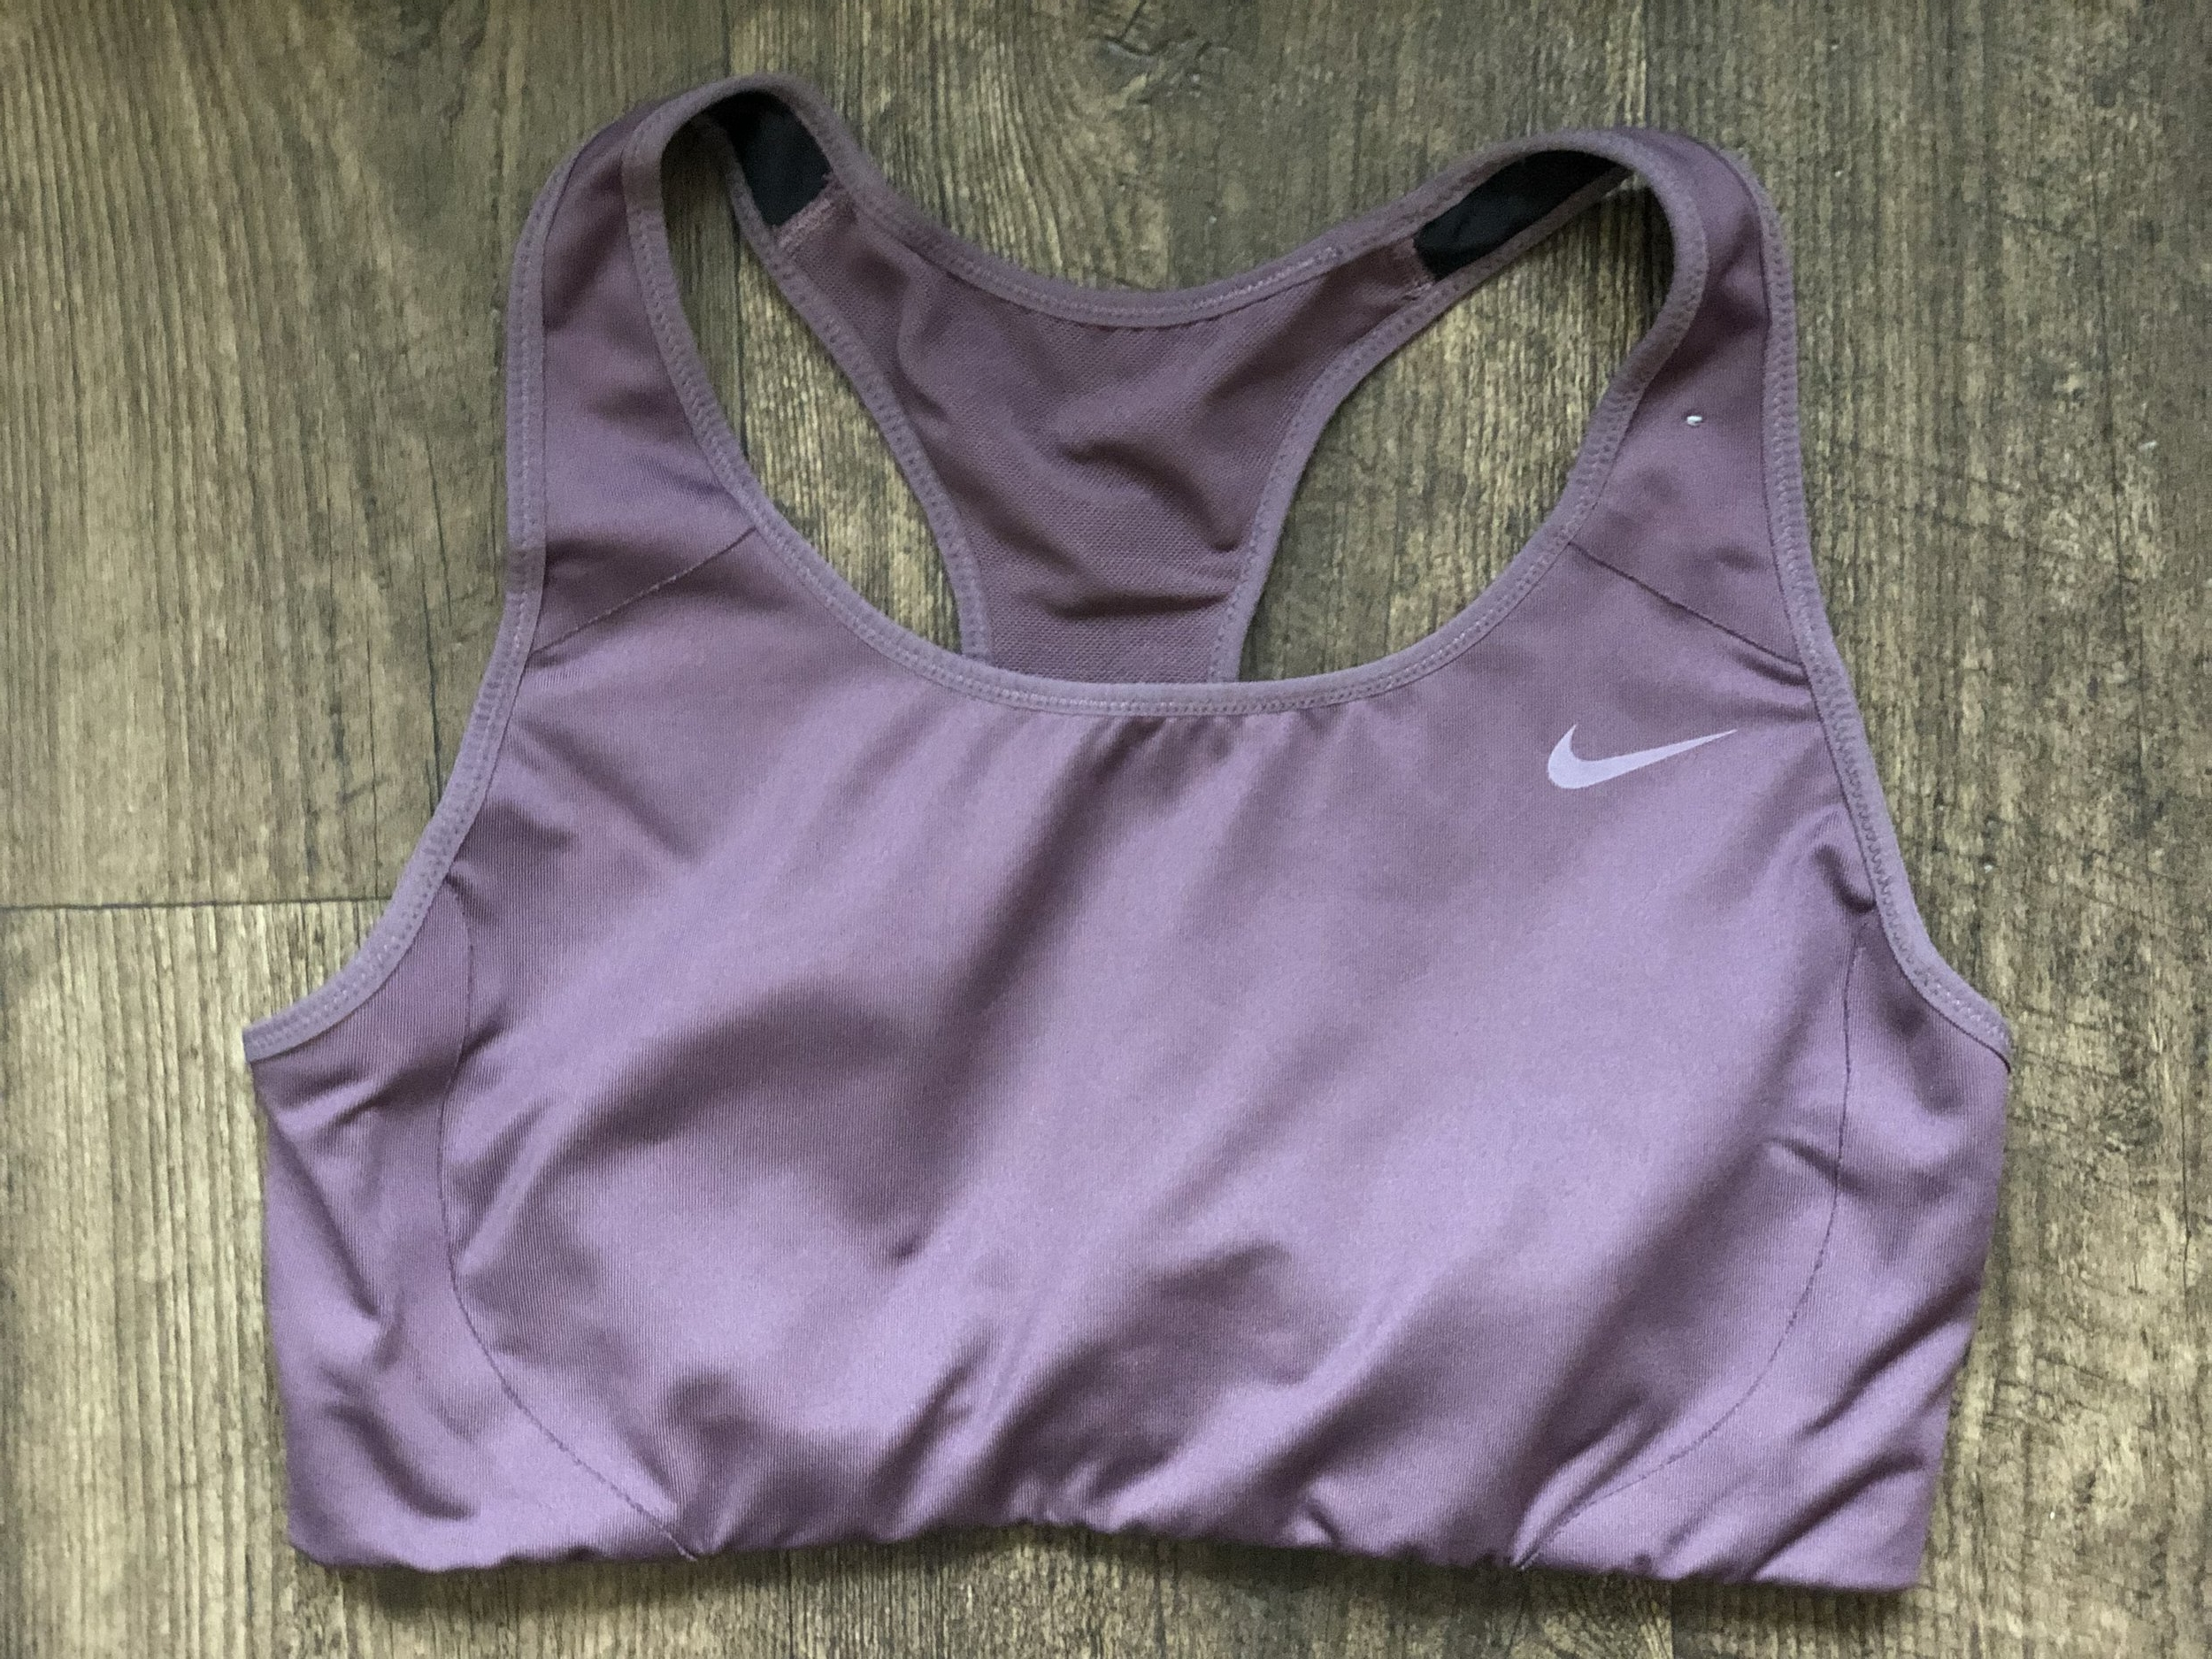 Nike Classic // $15